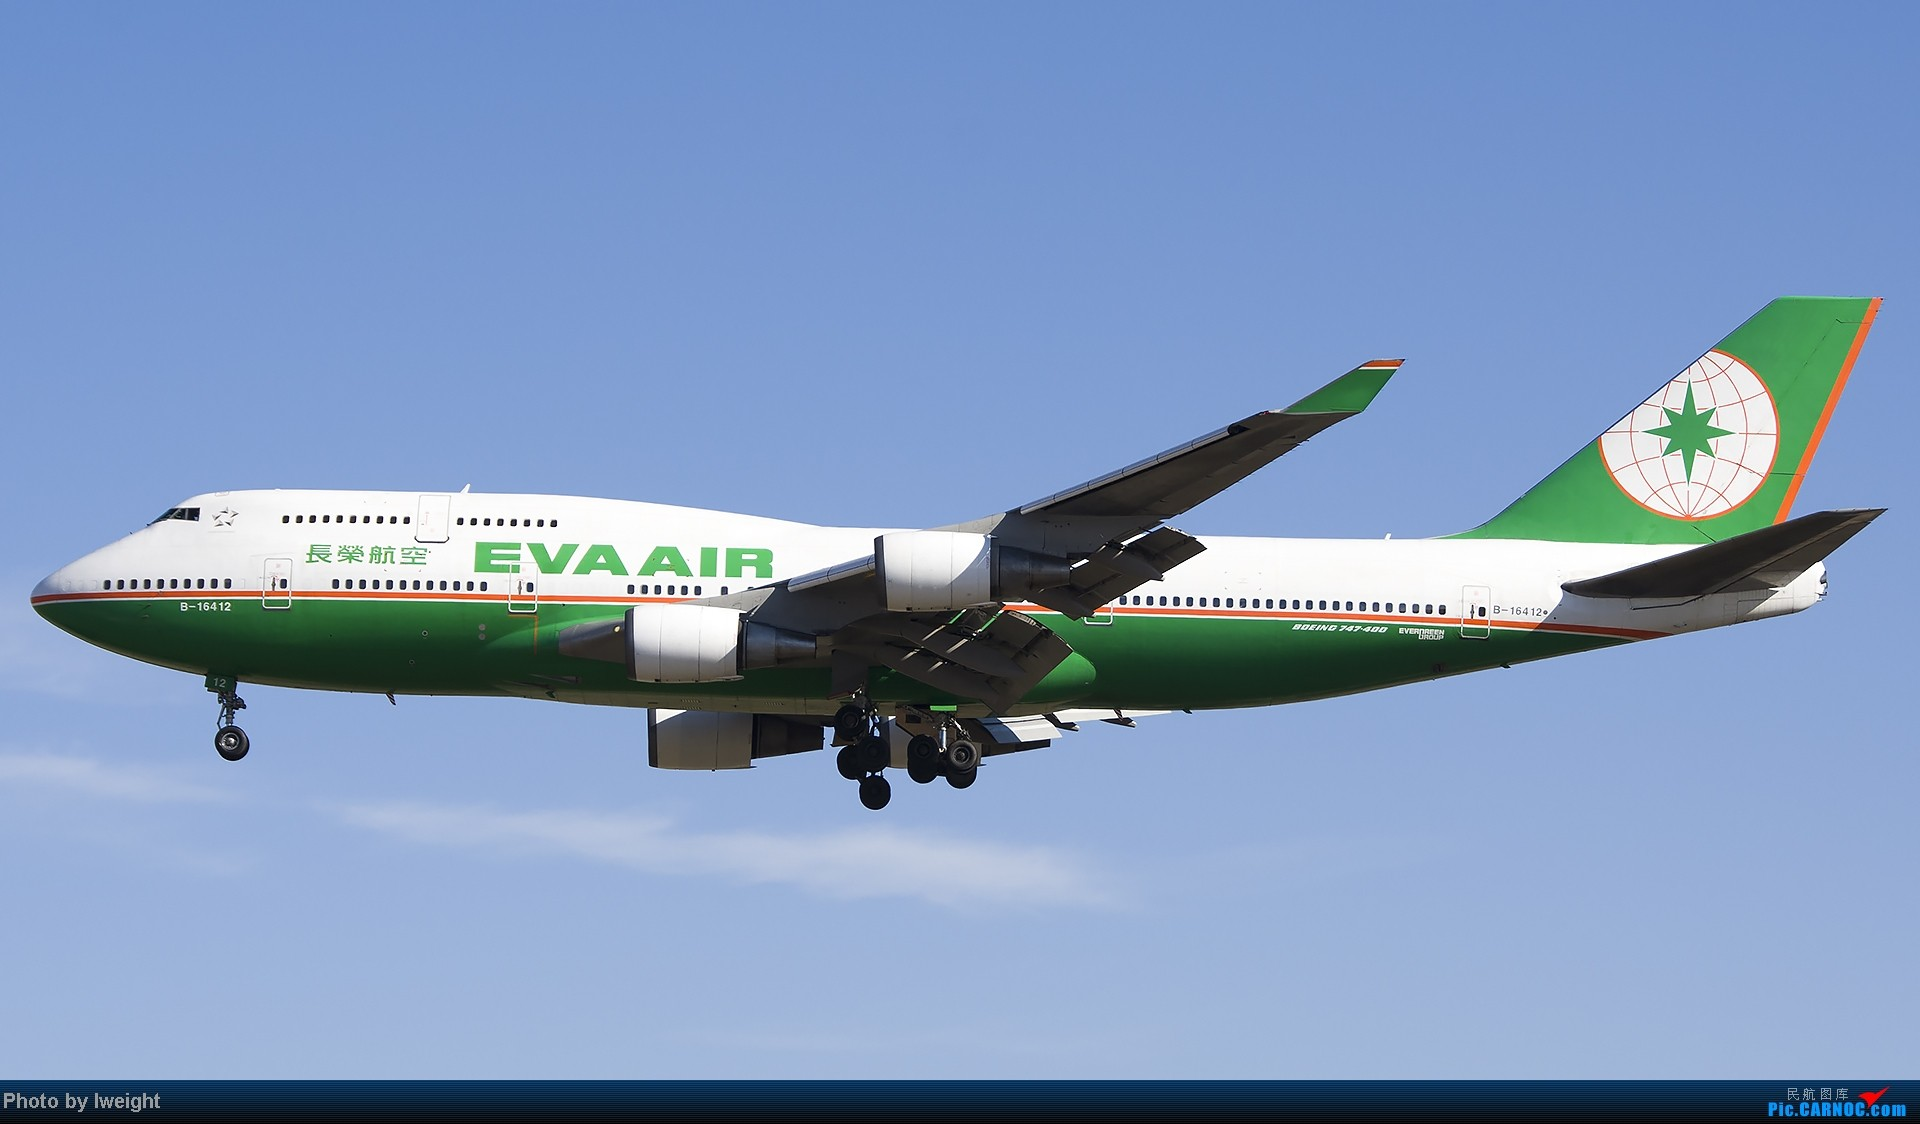 Re:[原创]抓住APEC蓝的尾巴,再拍上一组 BOEING 747-400 B-16412 中国北京首都机场